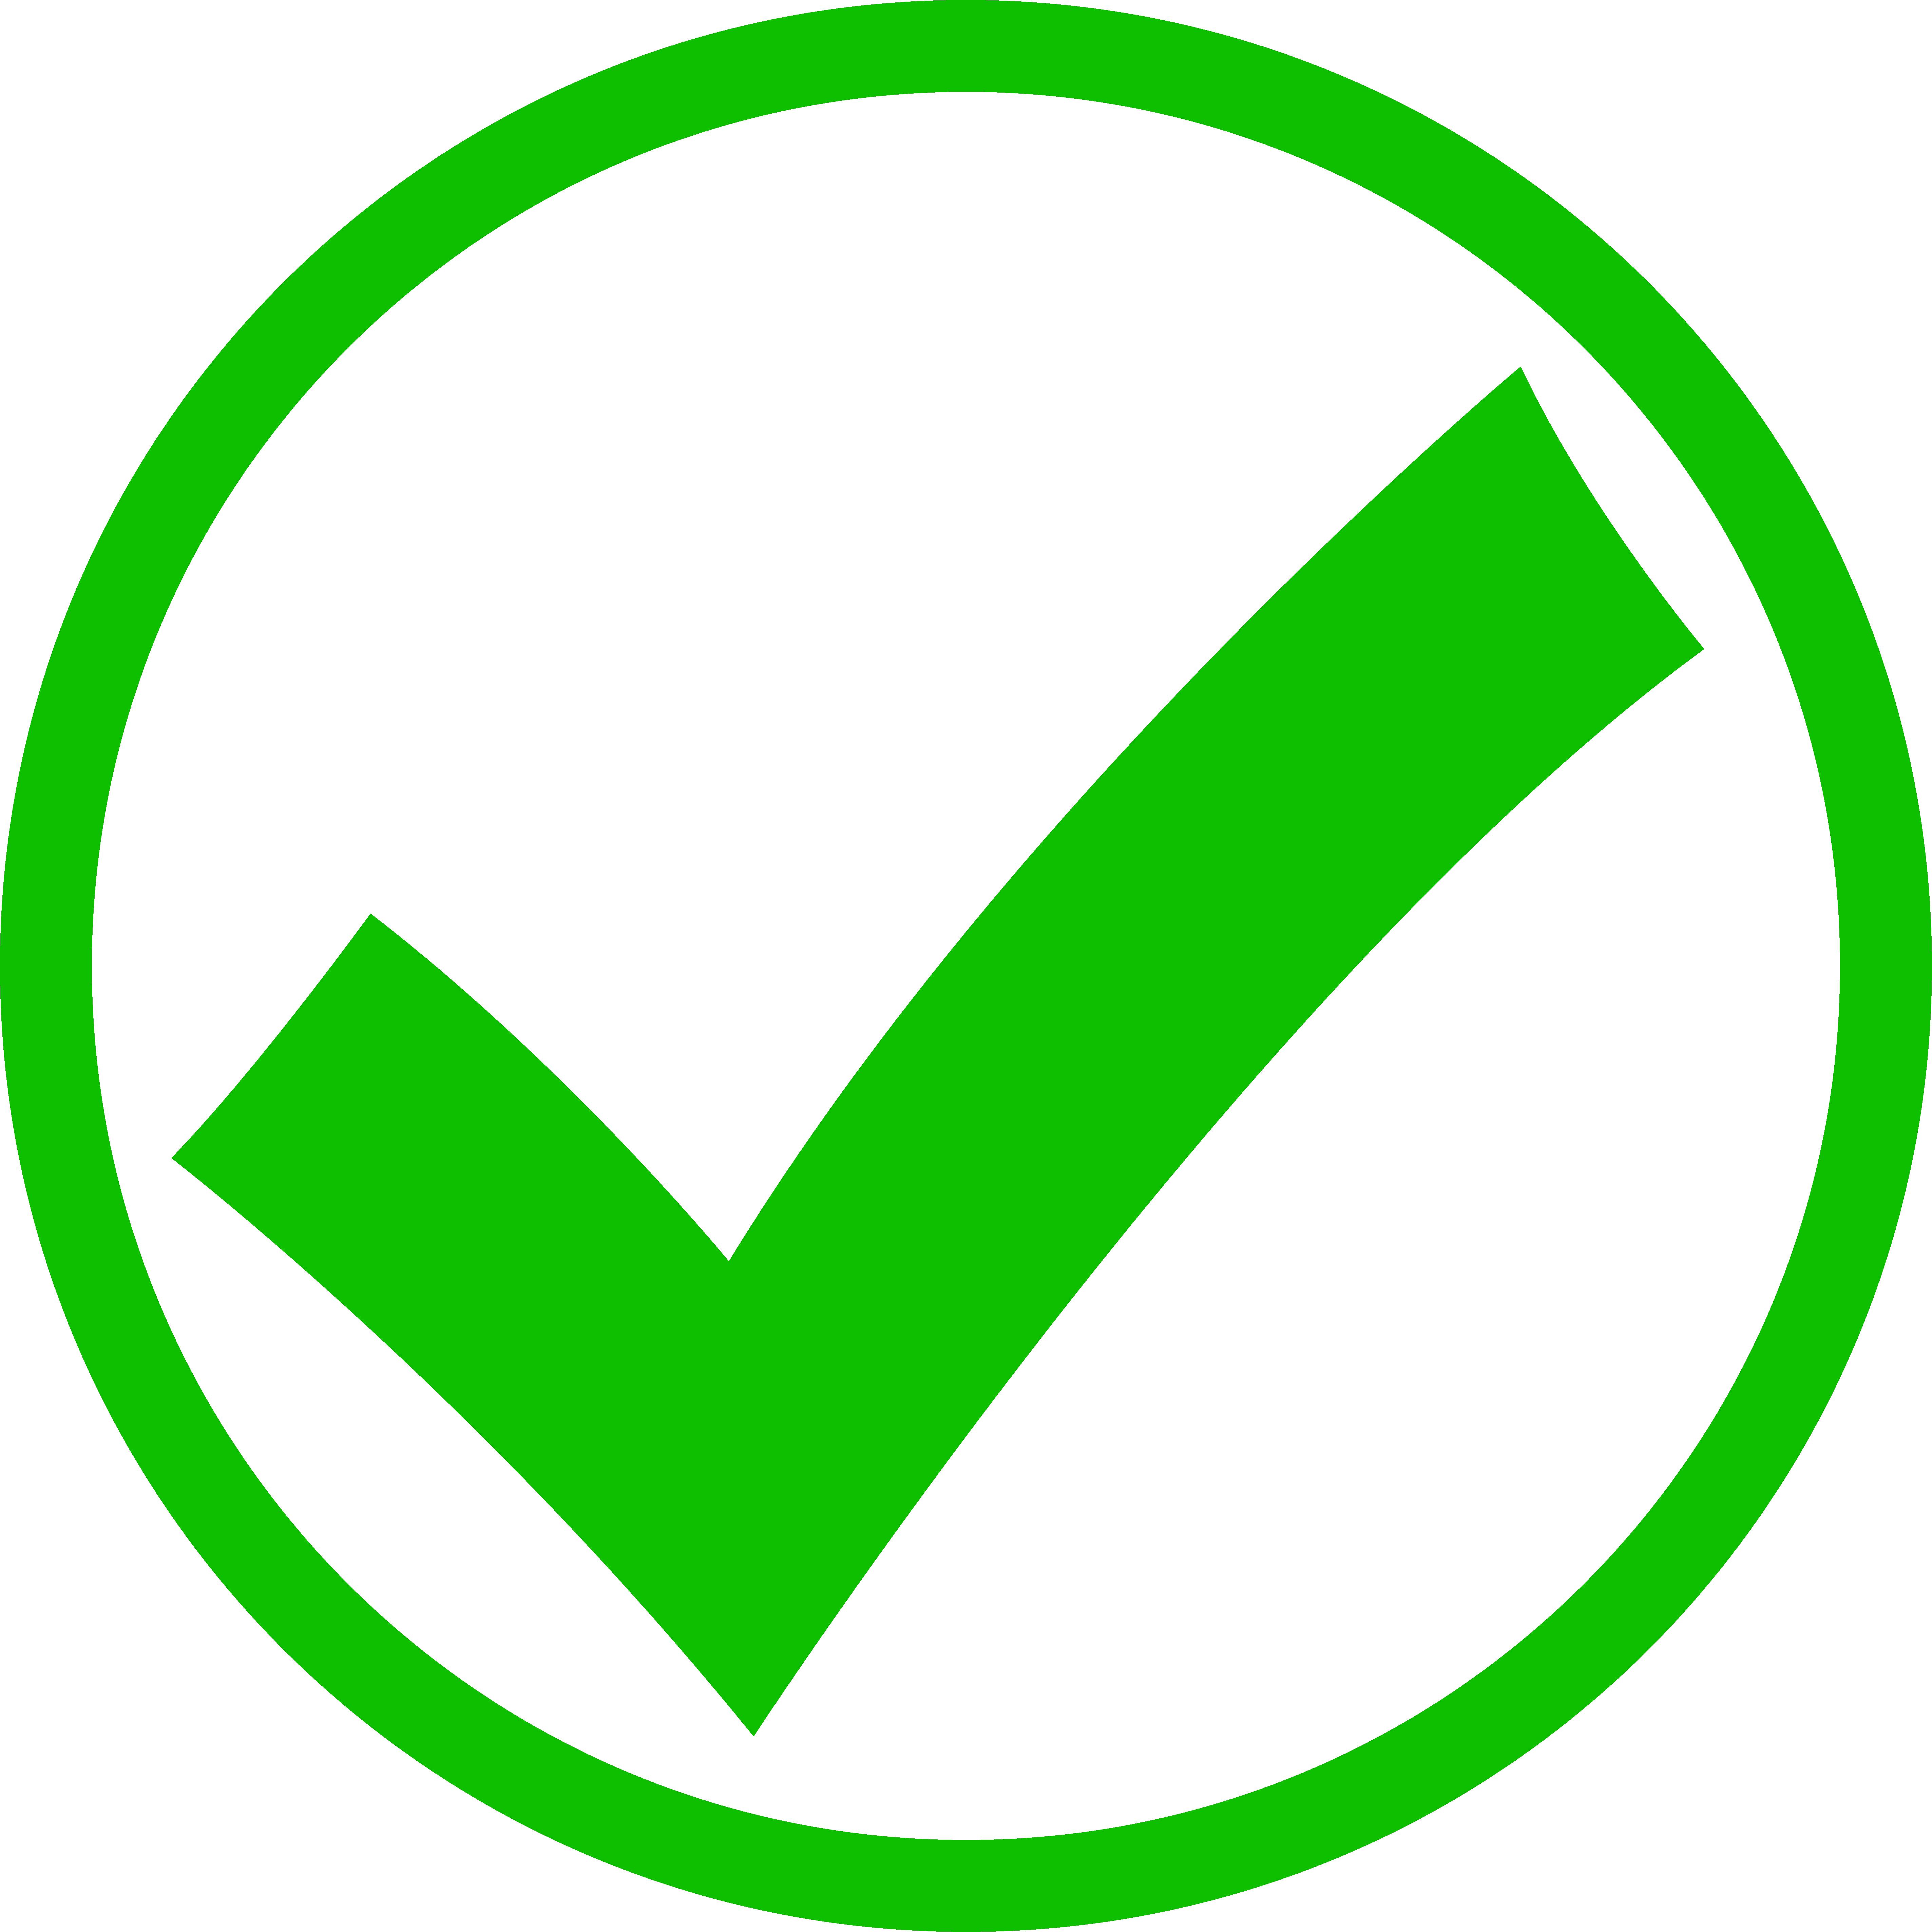 5695x5695 Green Check Mark In Circle